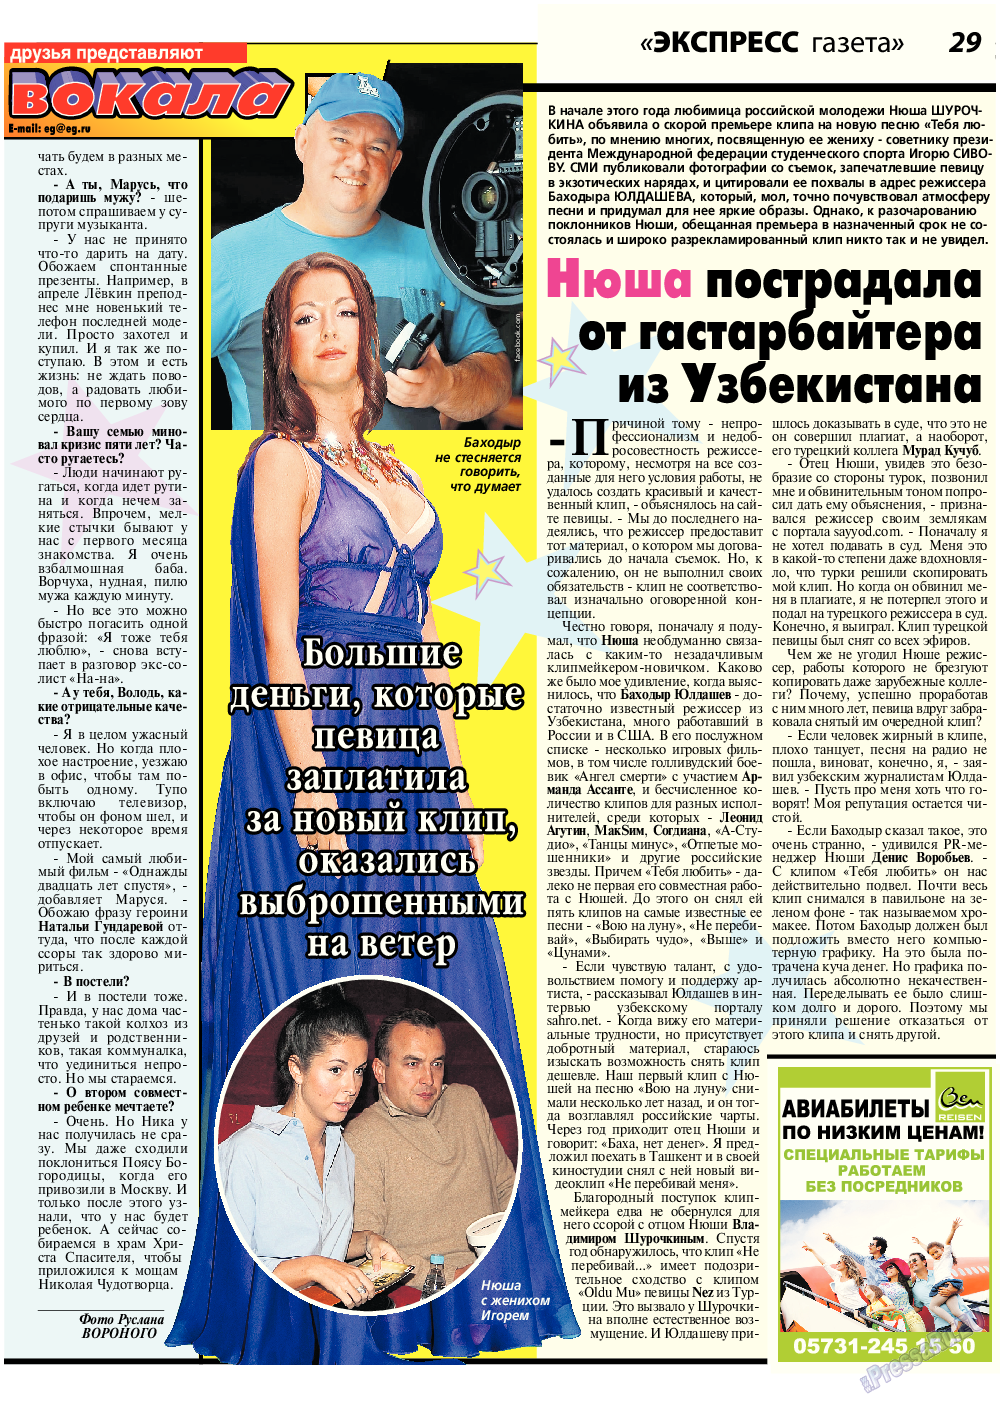 Экспресс газета (газета). 2017 год, номер 8, стр. 29